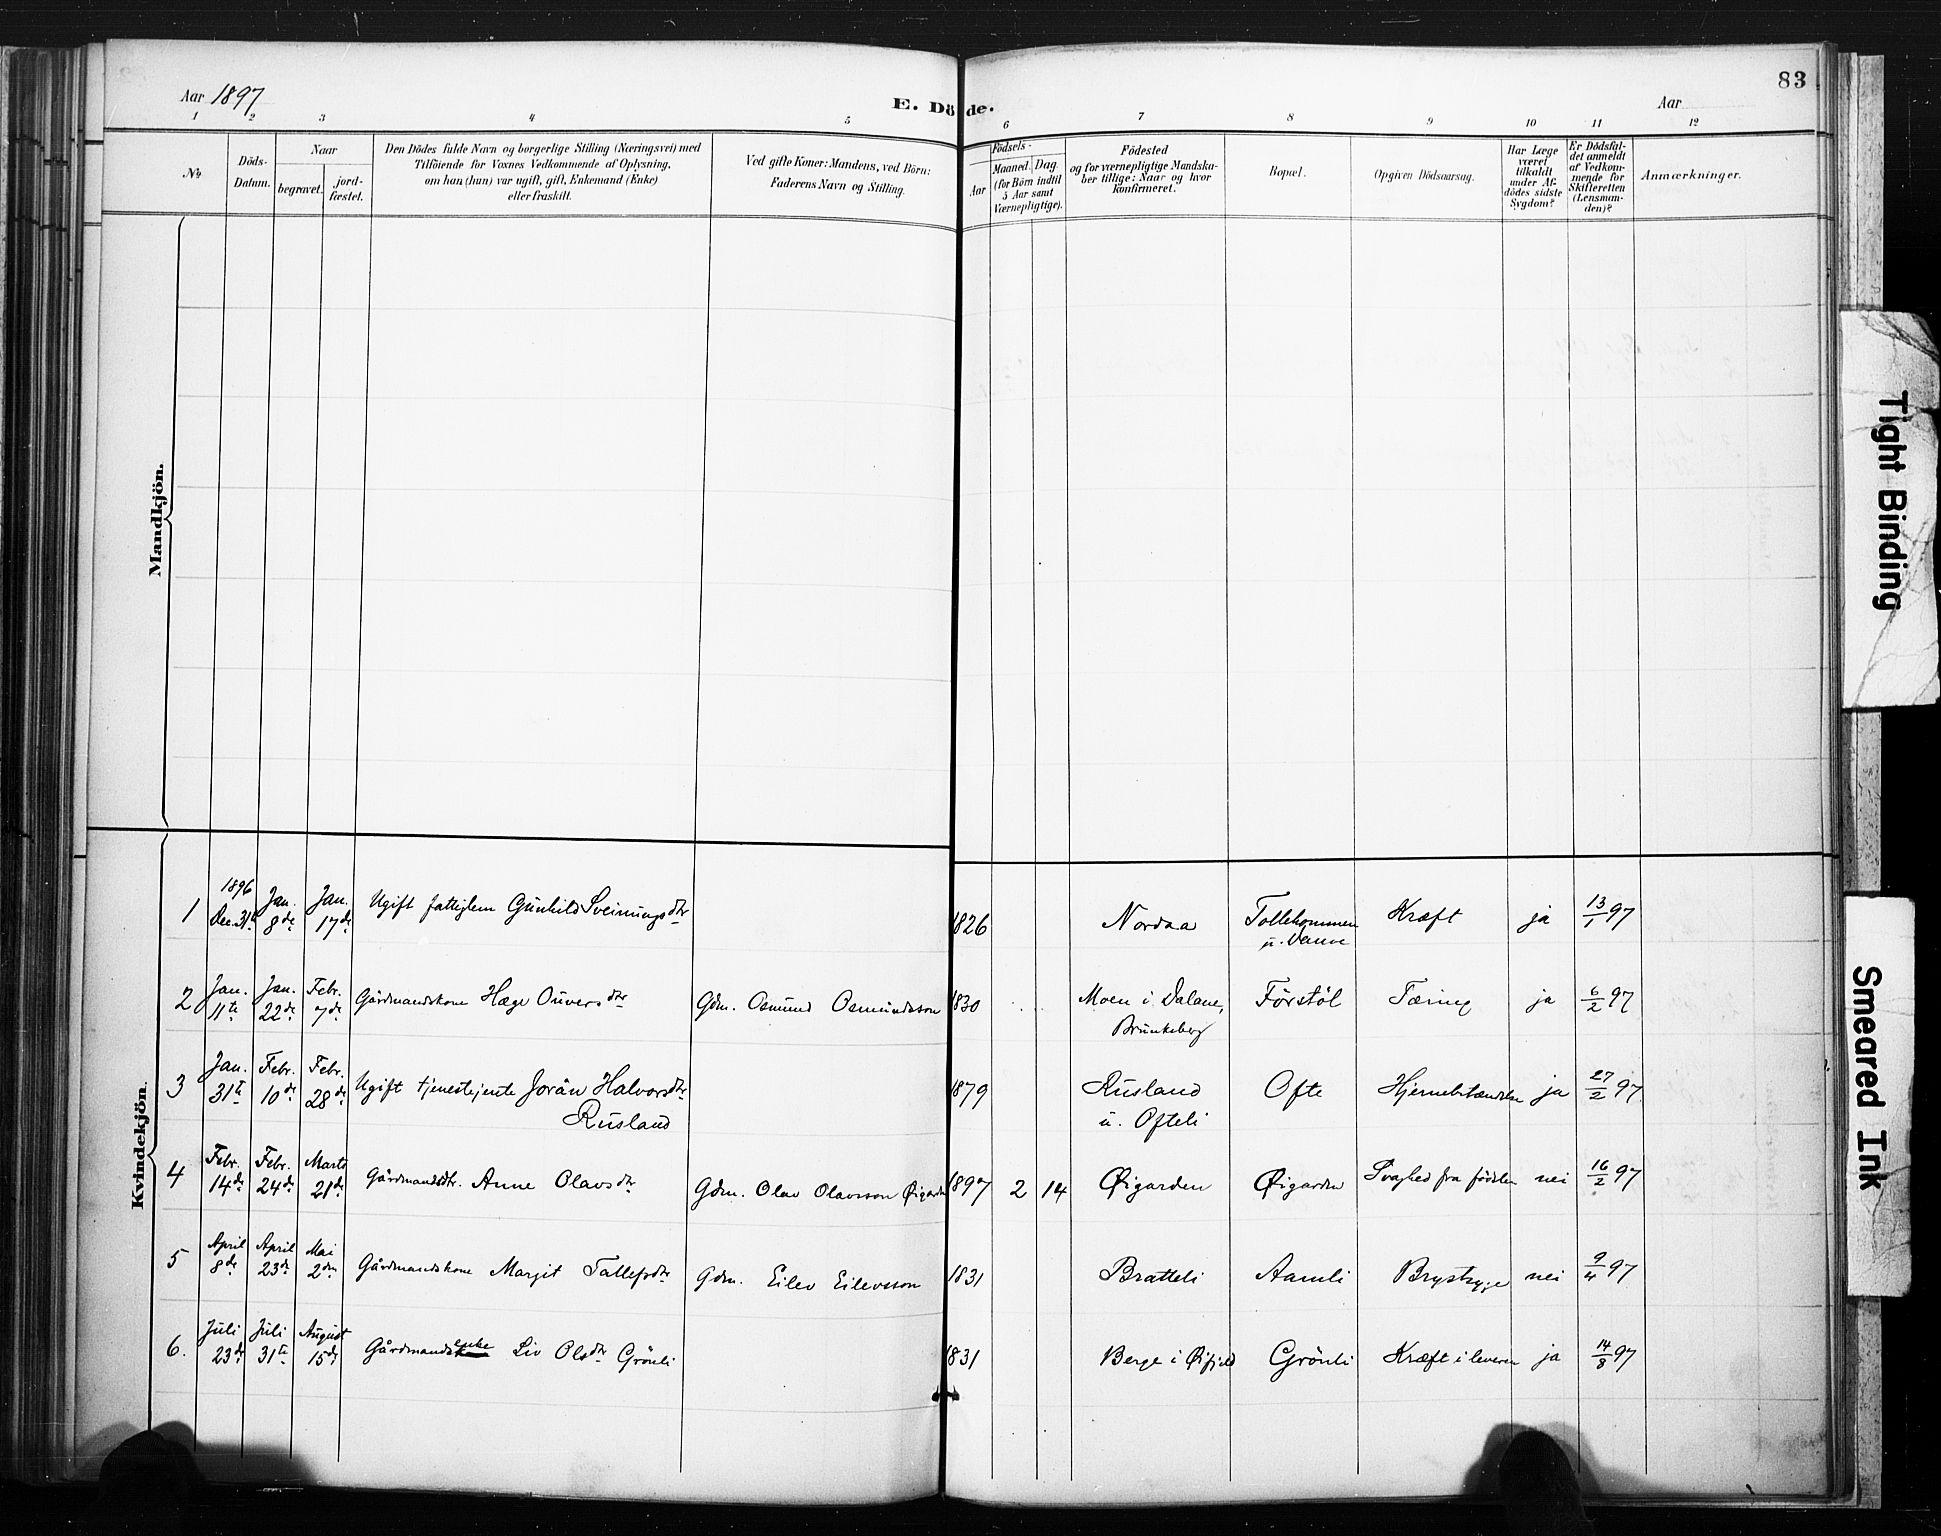 SAKO, Lårdal kirkebøker, F/Fc/L0002: Ministerialbok nr. III 2, 1887-1906, s. 83